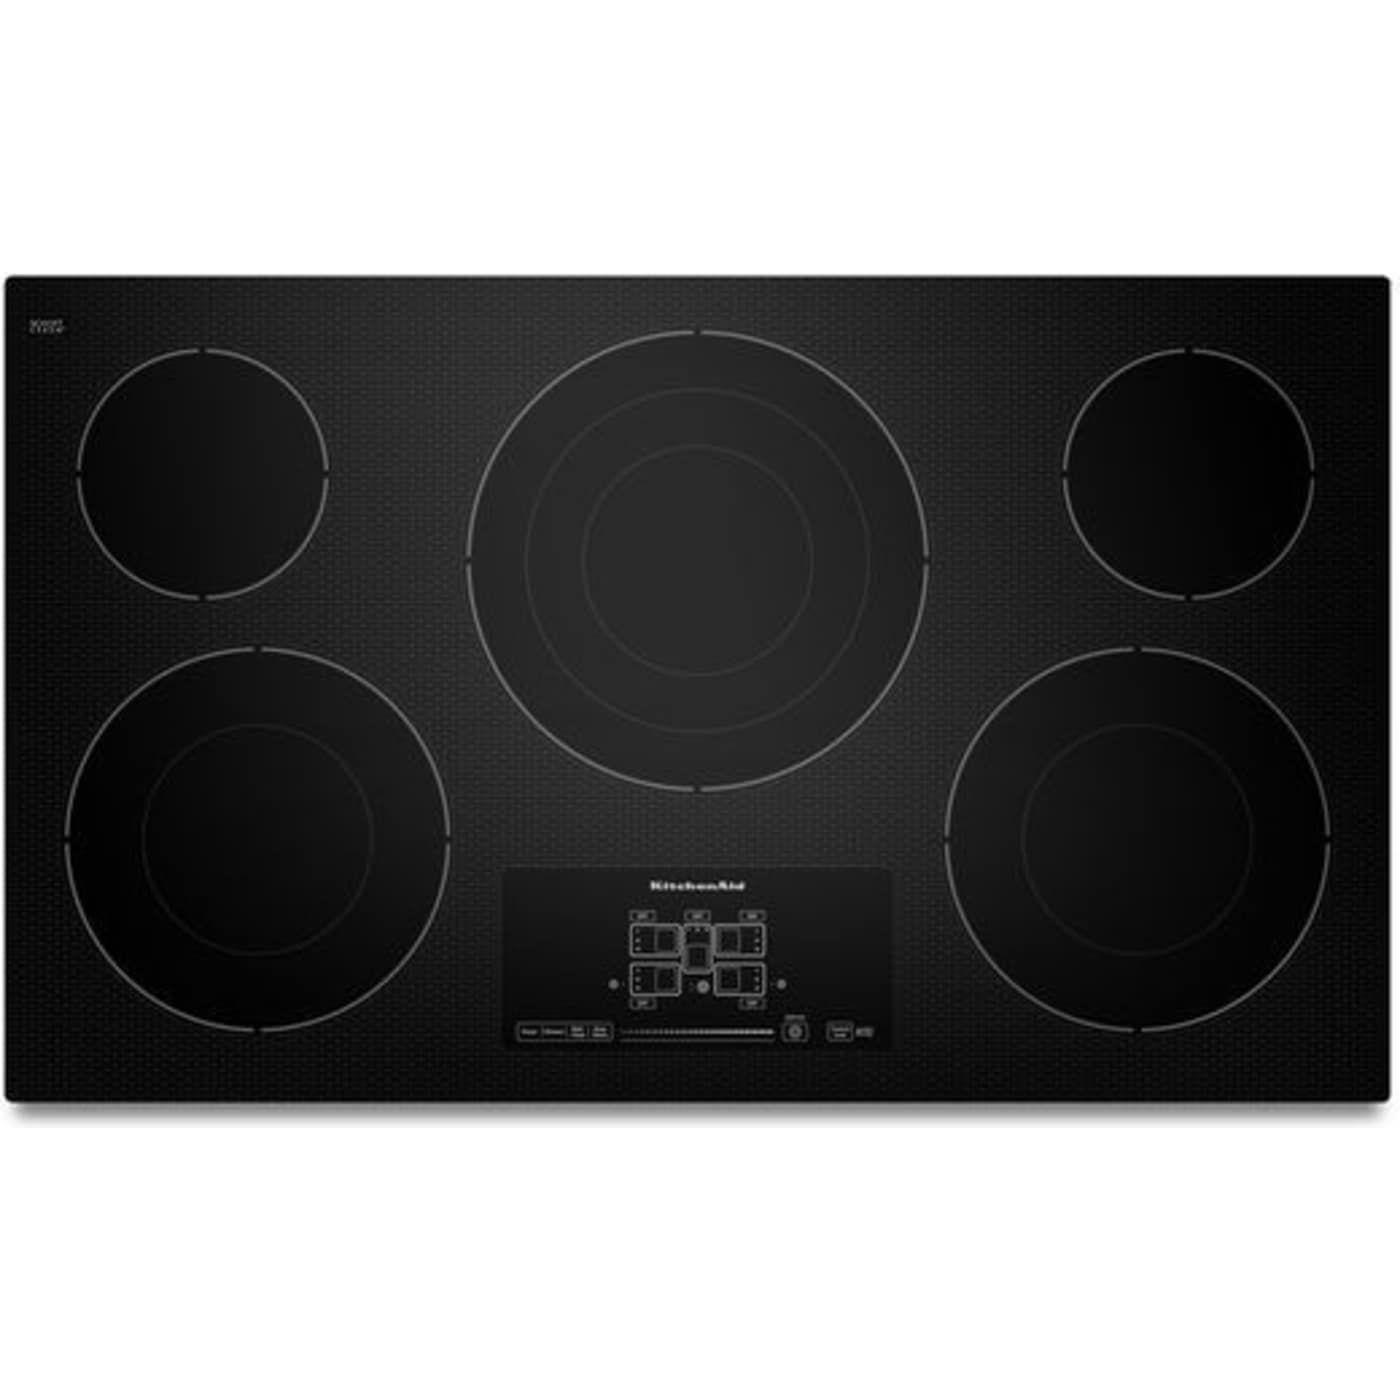 Kitchenaid Kecc667bbl Kitchen Aid Electric Cooktop Cooktop